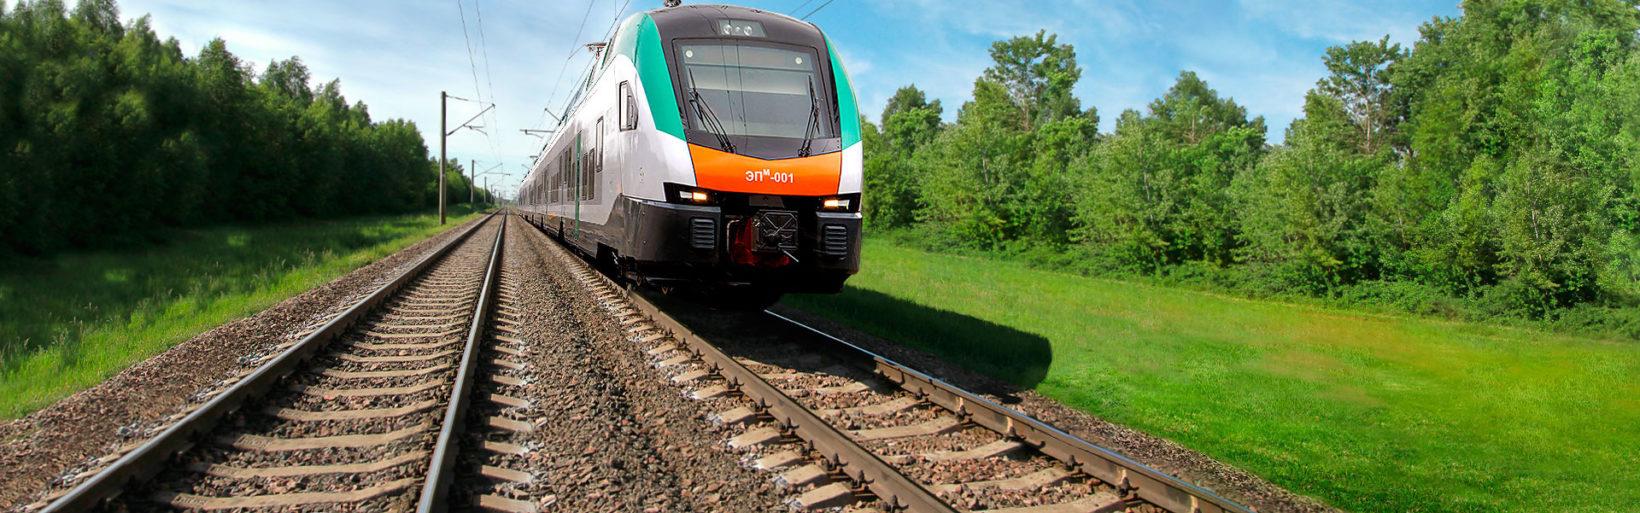 Междугородний поезд бизнес-класса в Беларуси